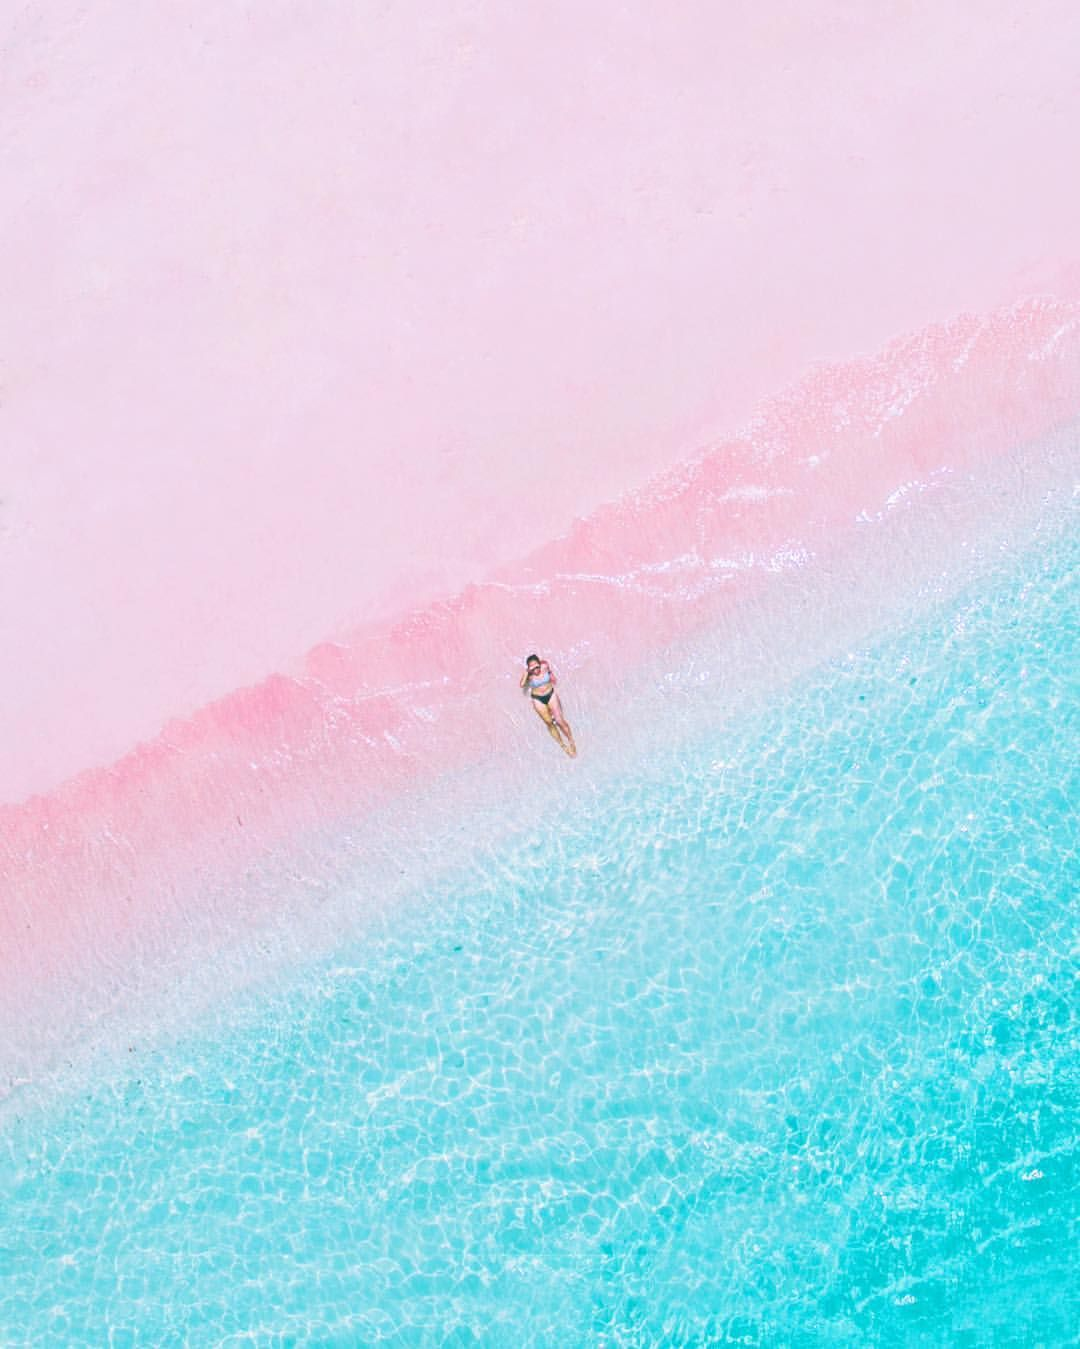 Pink Beach Of Komodo Island Indonesia Photo By Folkindonesia Pink Sand Beach Pink Sand Beach Hawaii Pink Beach